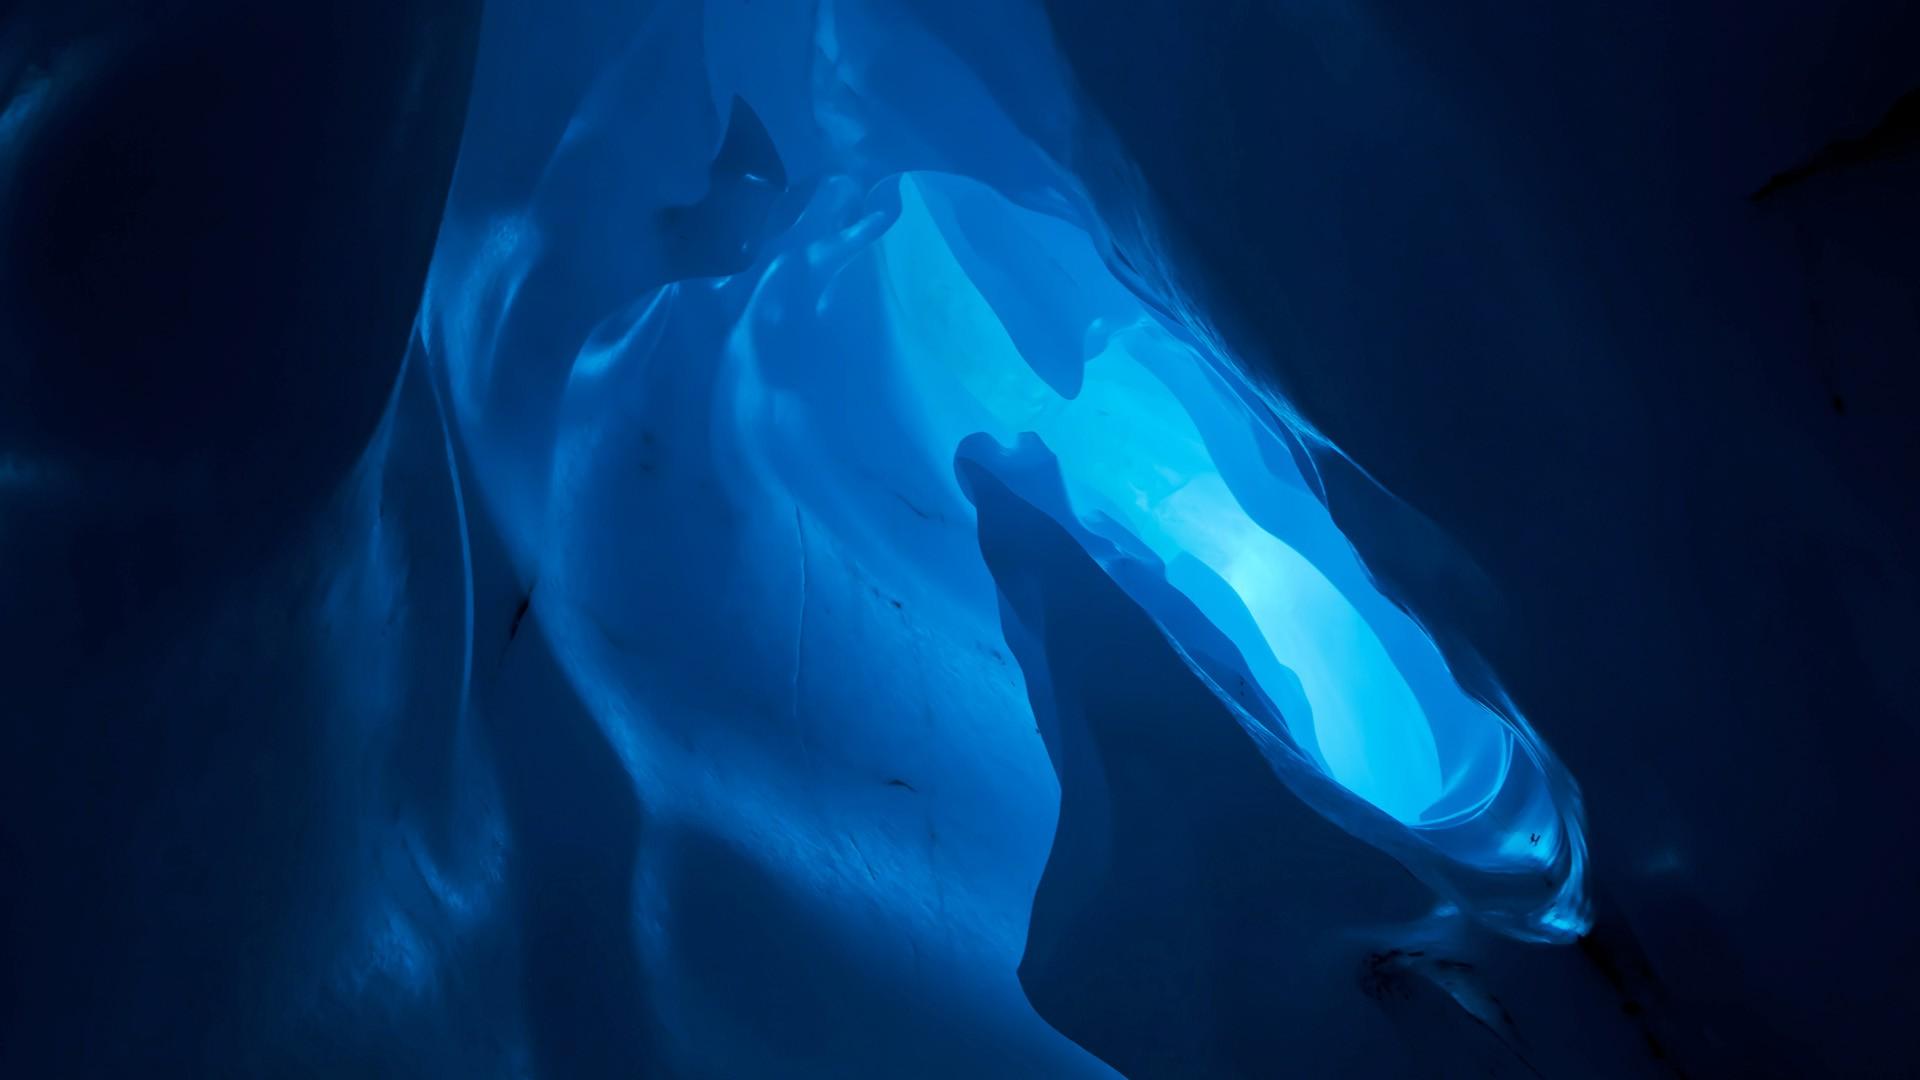 cool iceberg wallpaper 33558